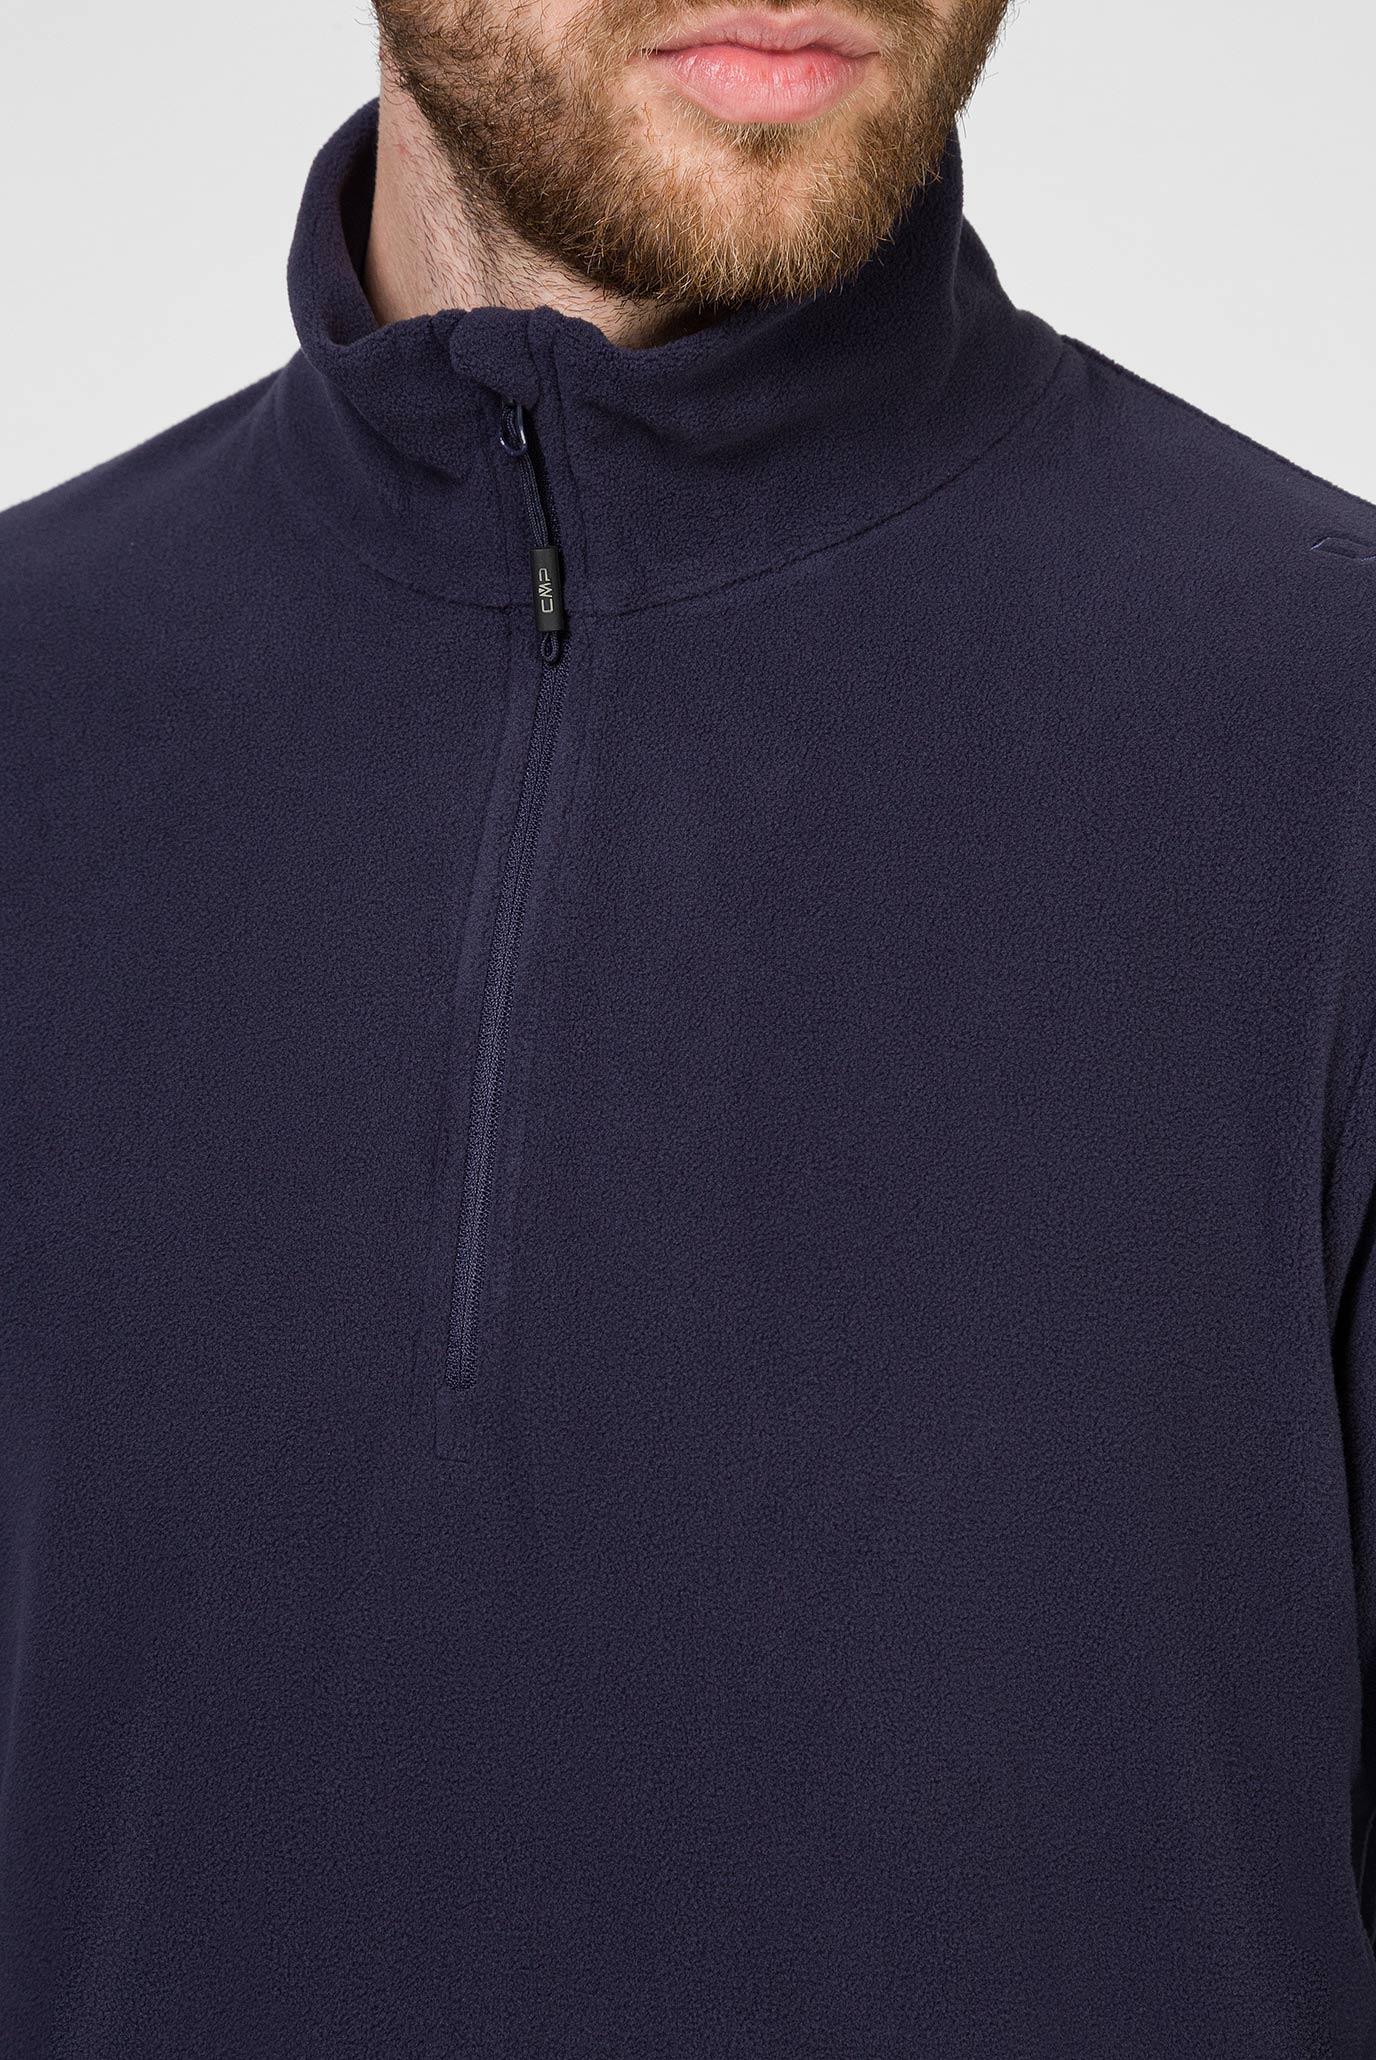 Мужская темно-синяя спортивная кофта CMP